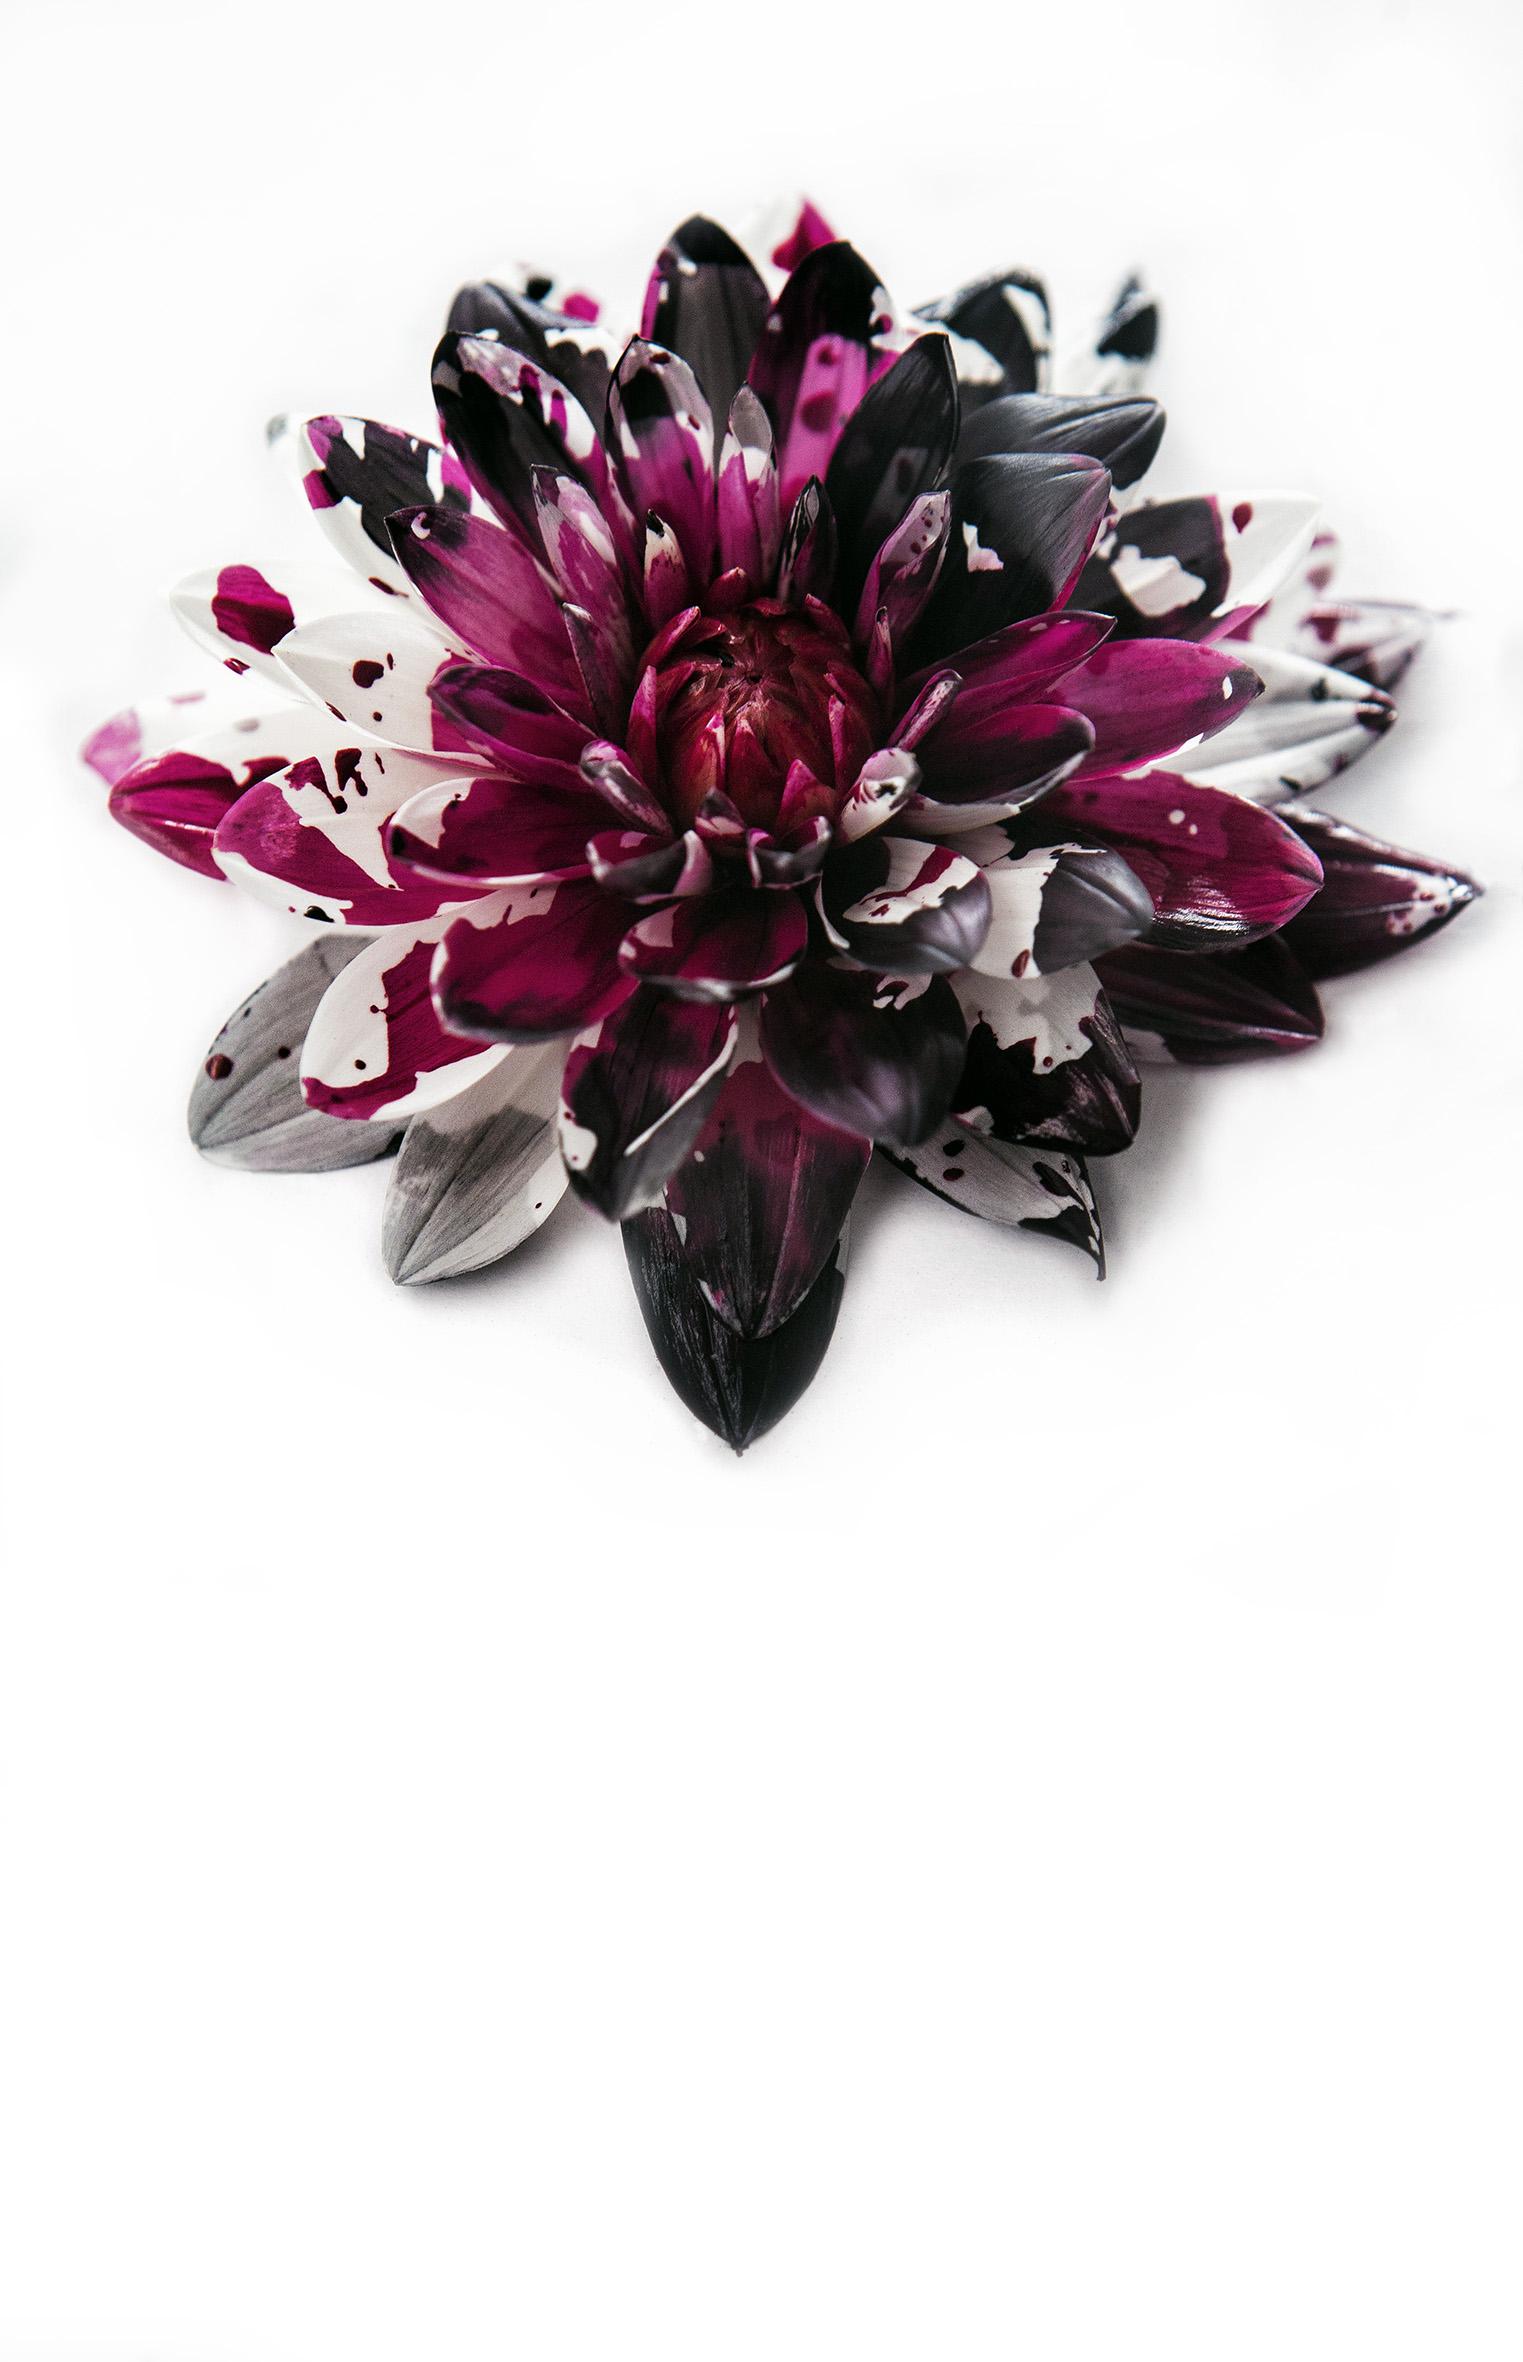 0001_Flower-07092015-0406 copy.jpg